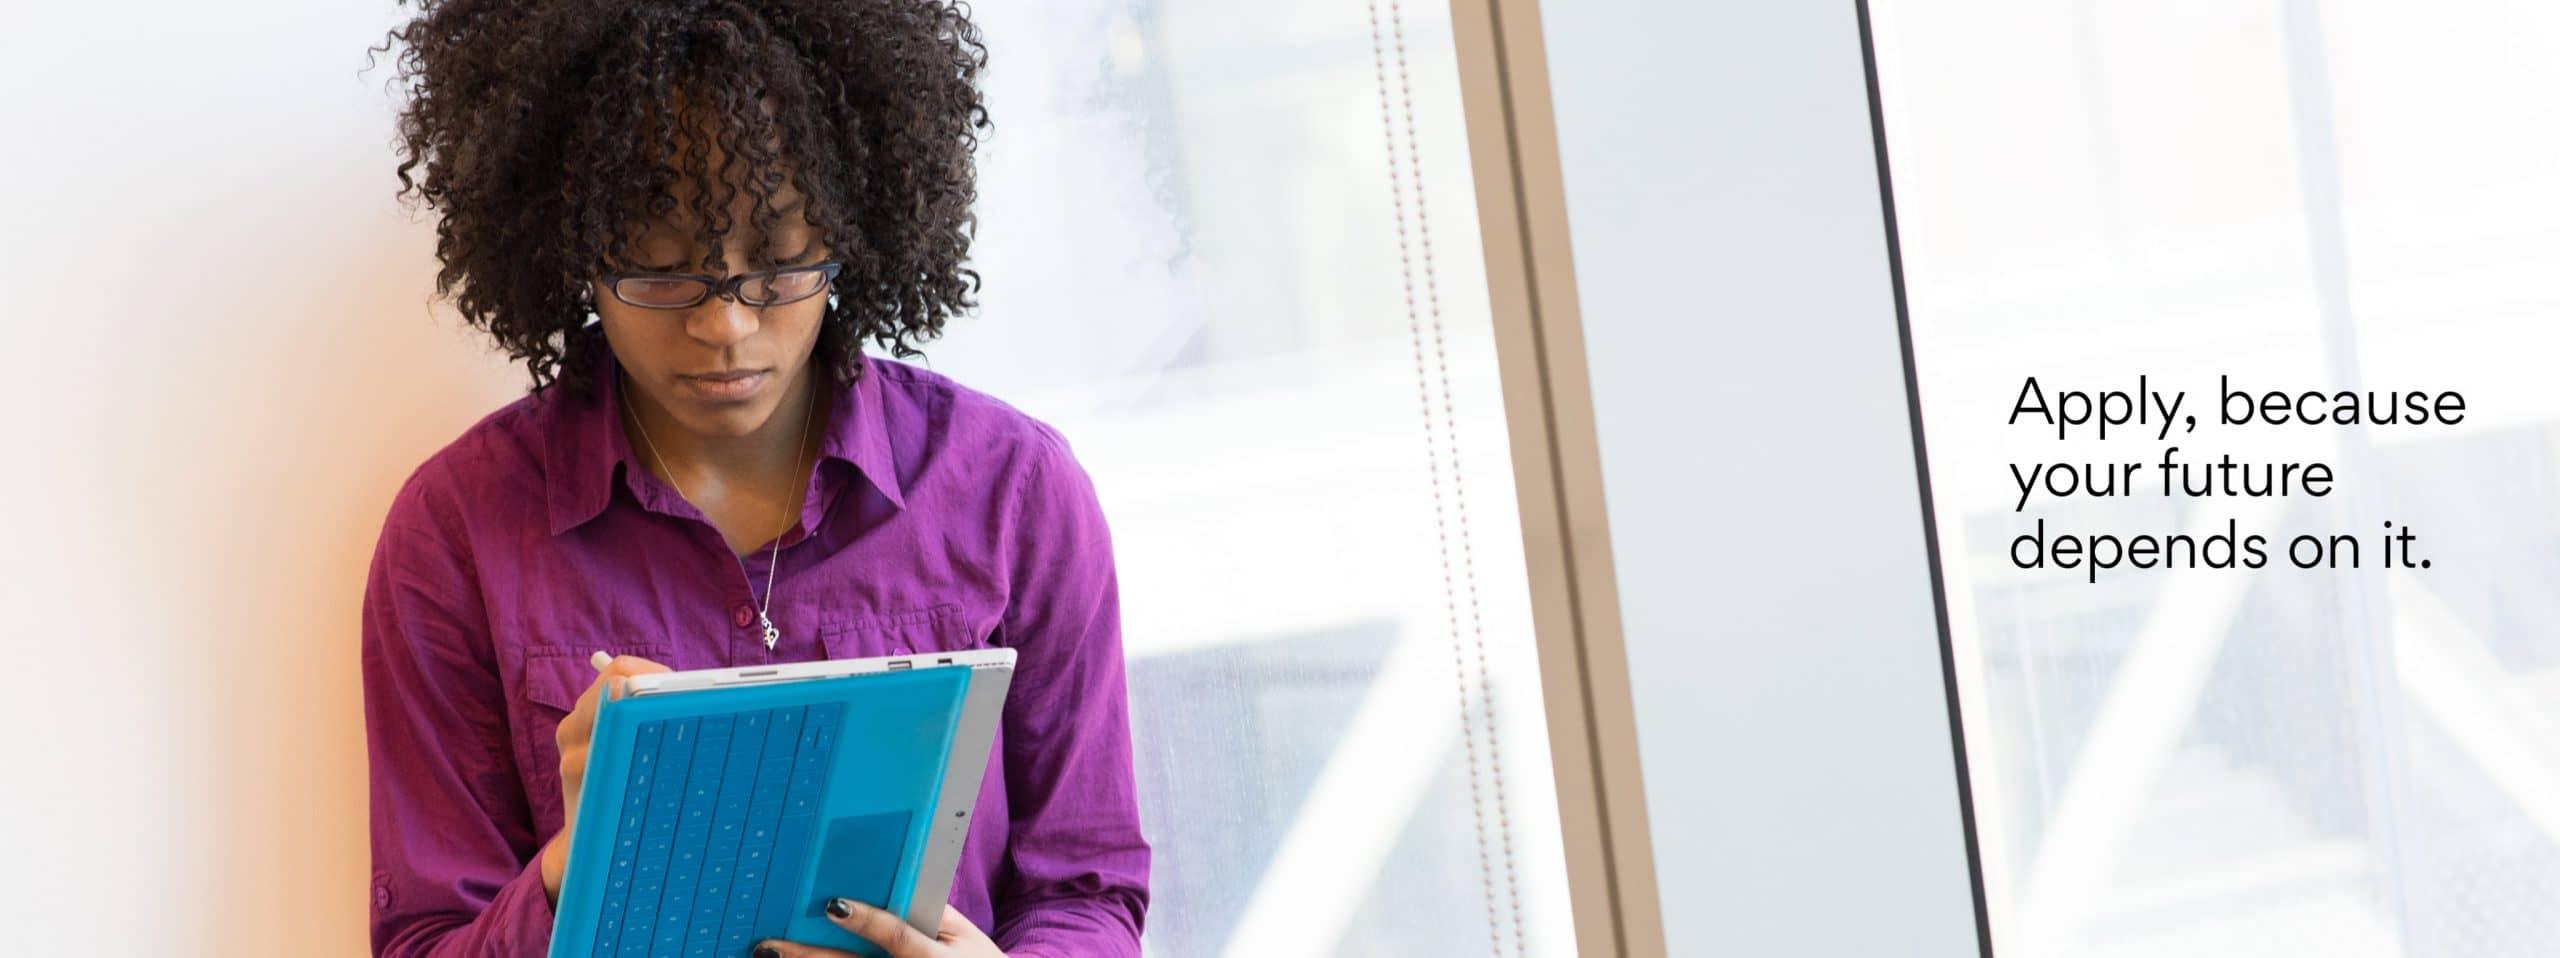 Black Student Applying to Scholarships